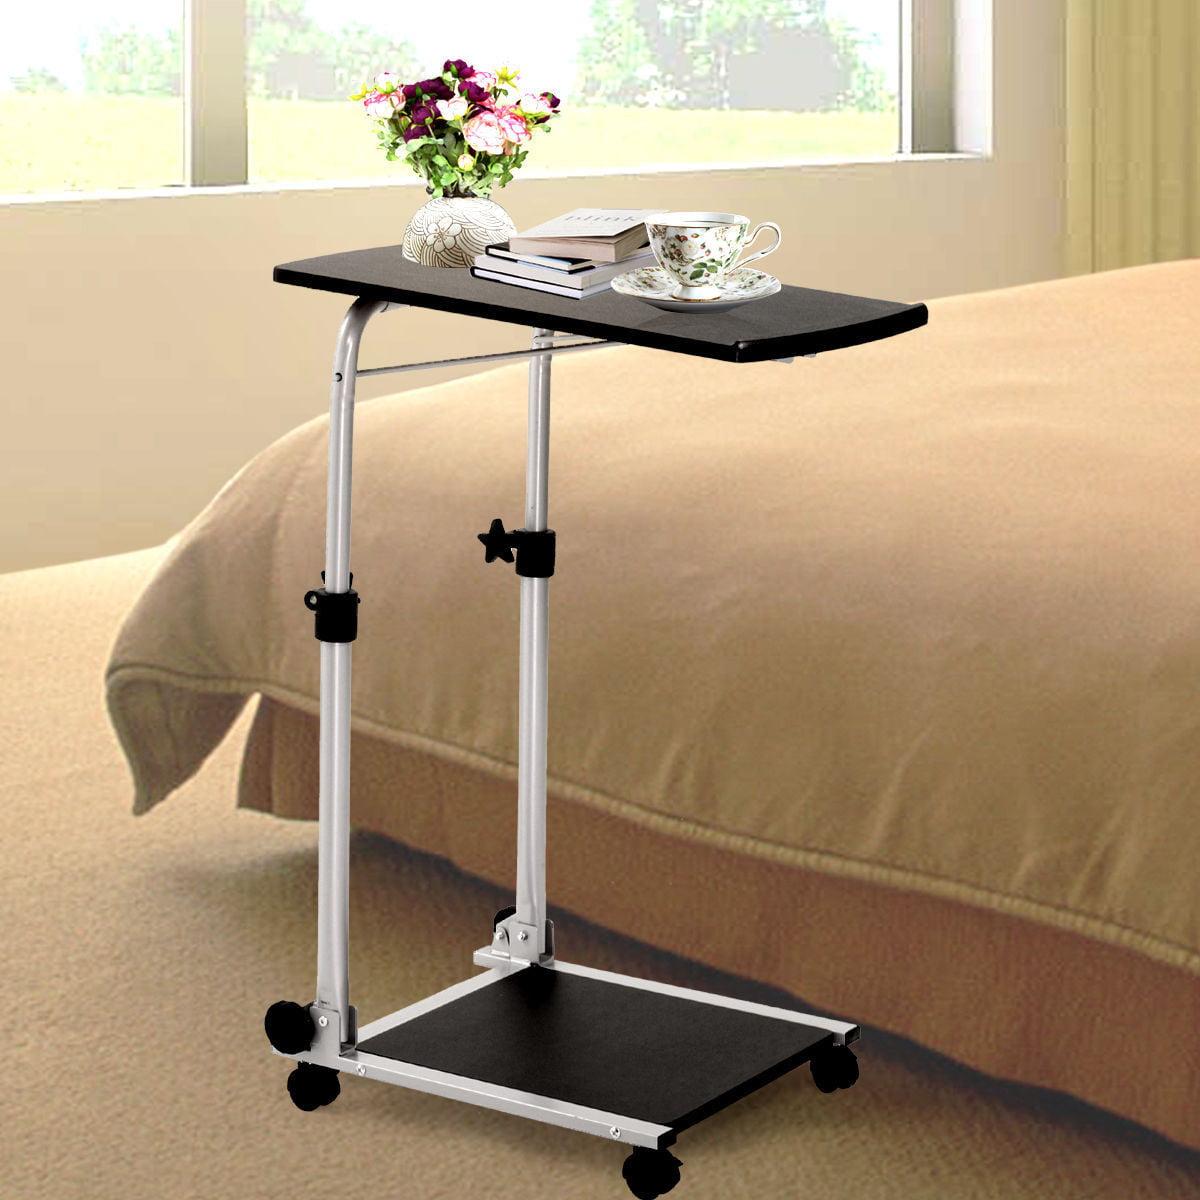 Folding Mobile Rolling Laptop Cart Table Bed Sofa Desk Tv